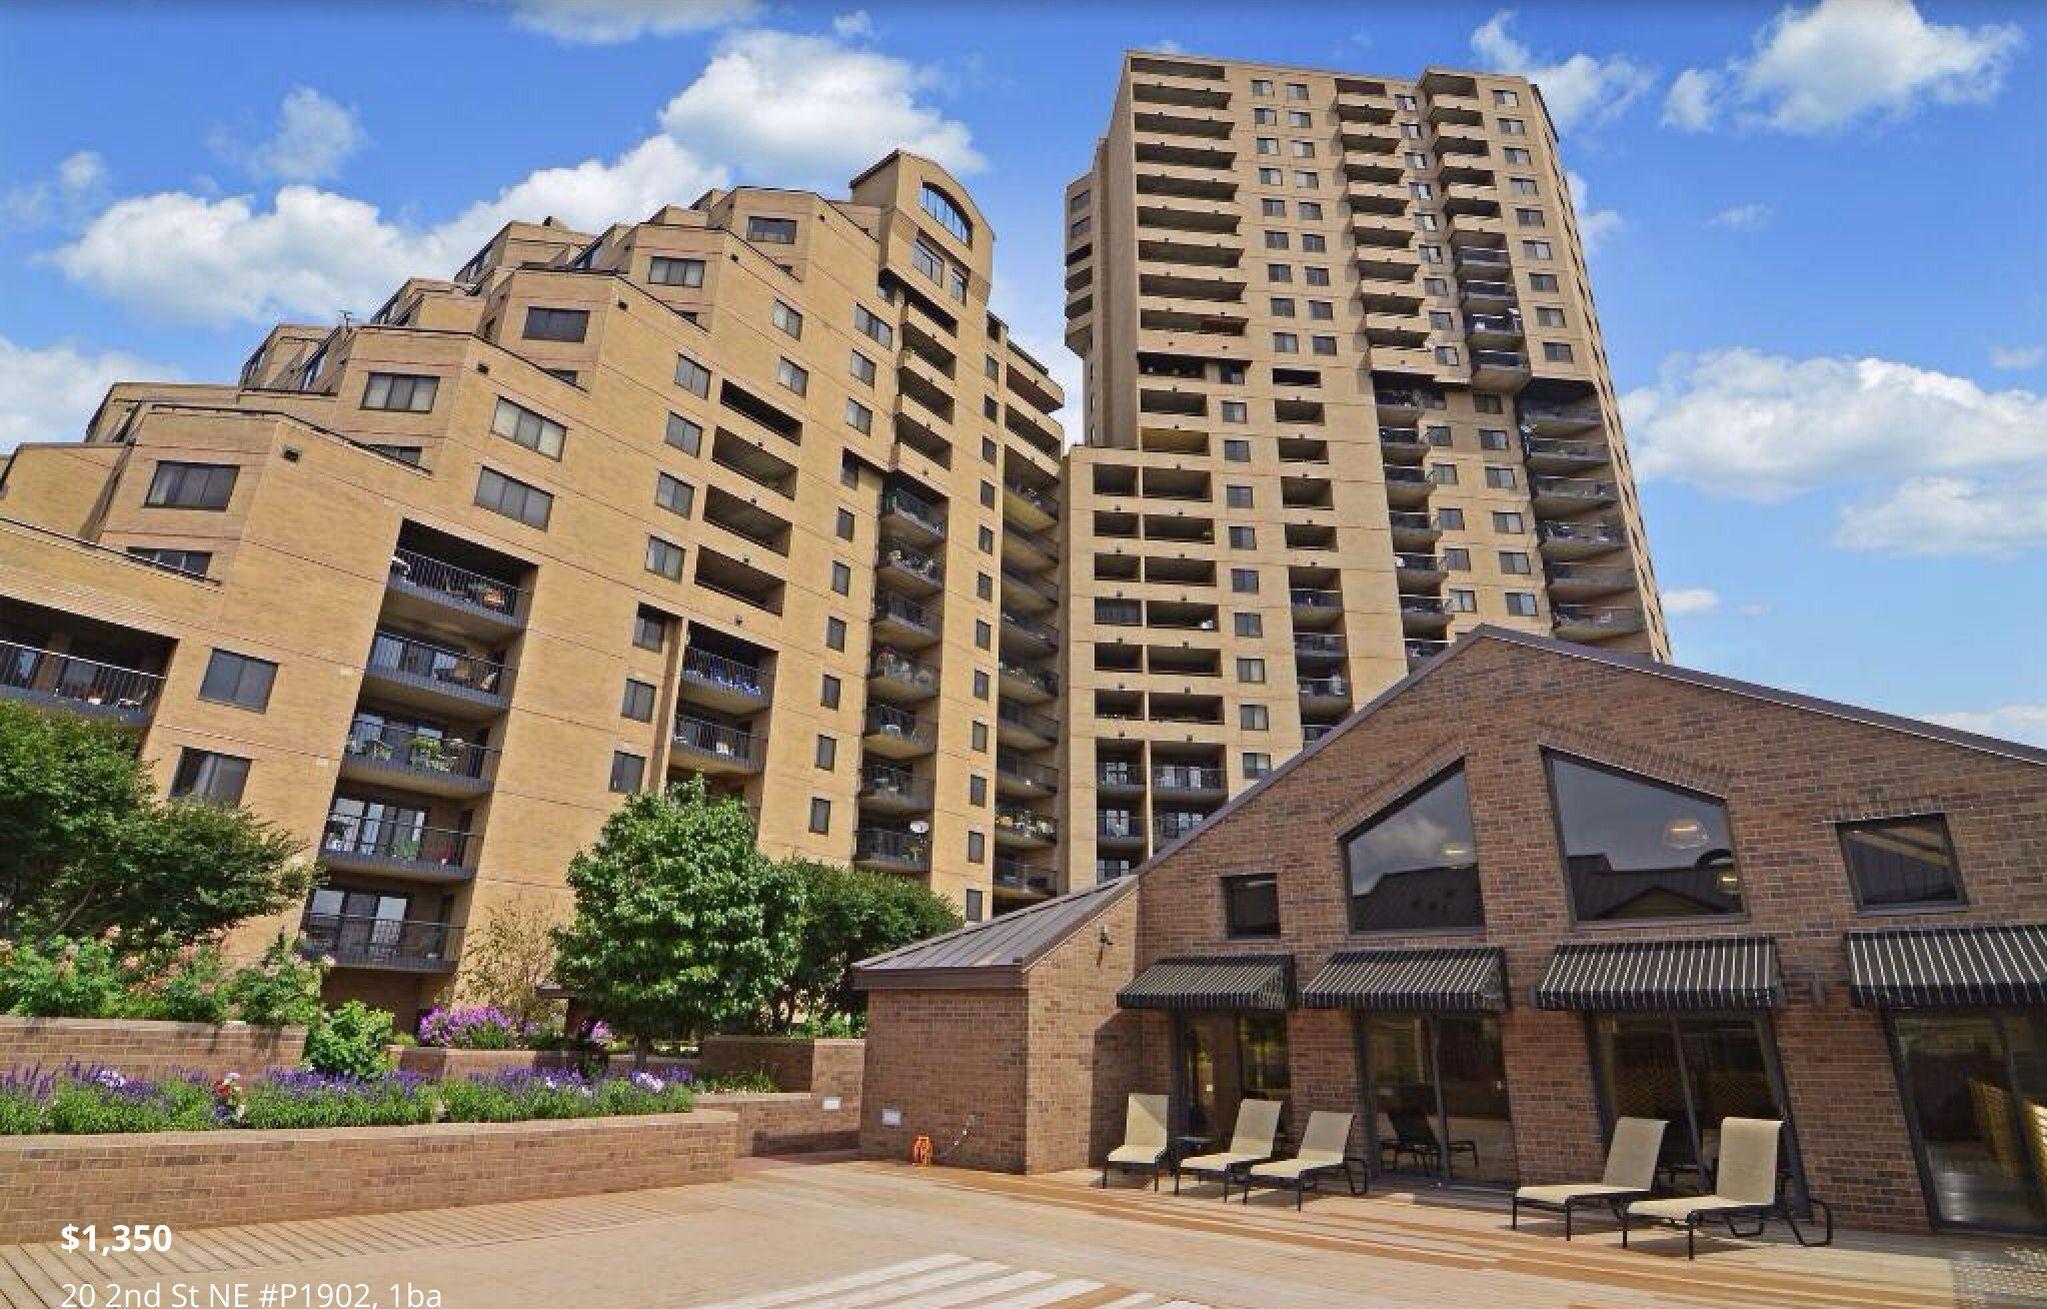 Apartment Buildings For Sale Minneapolis